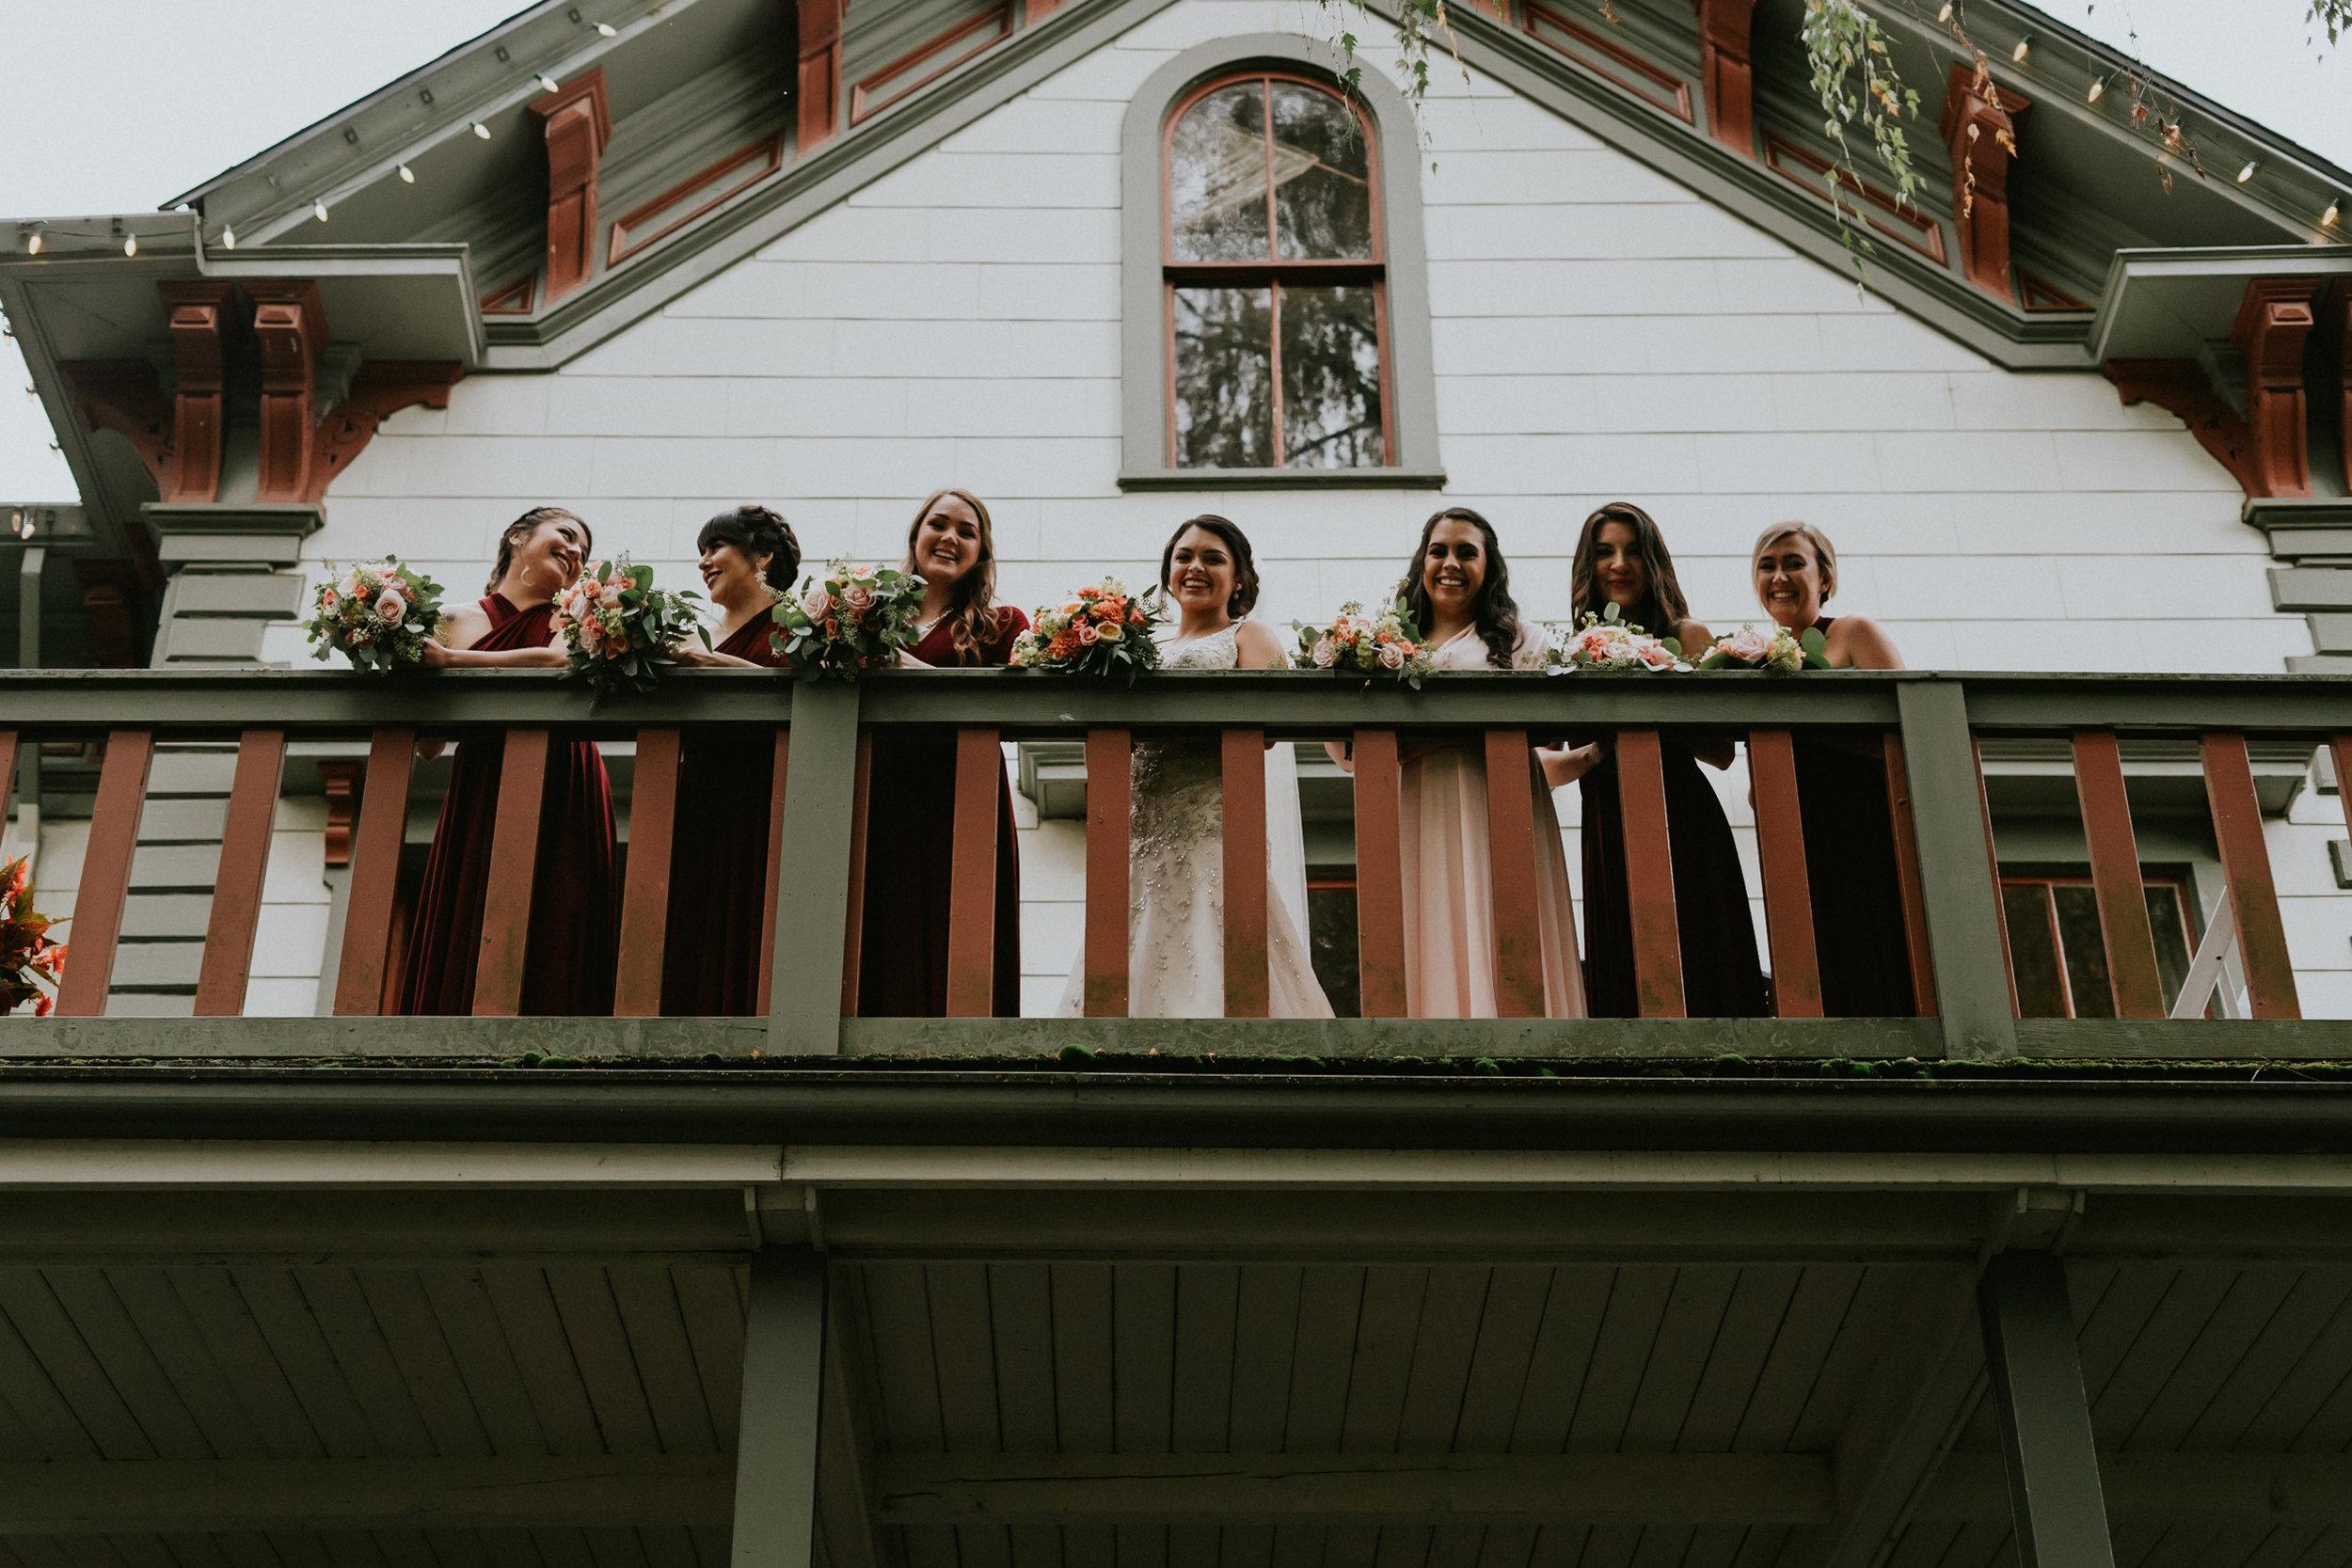 McMenamins_Cornelious_Pass_Roadhouse_wedding_photographer_AlfredTang-2.jpg